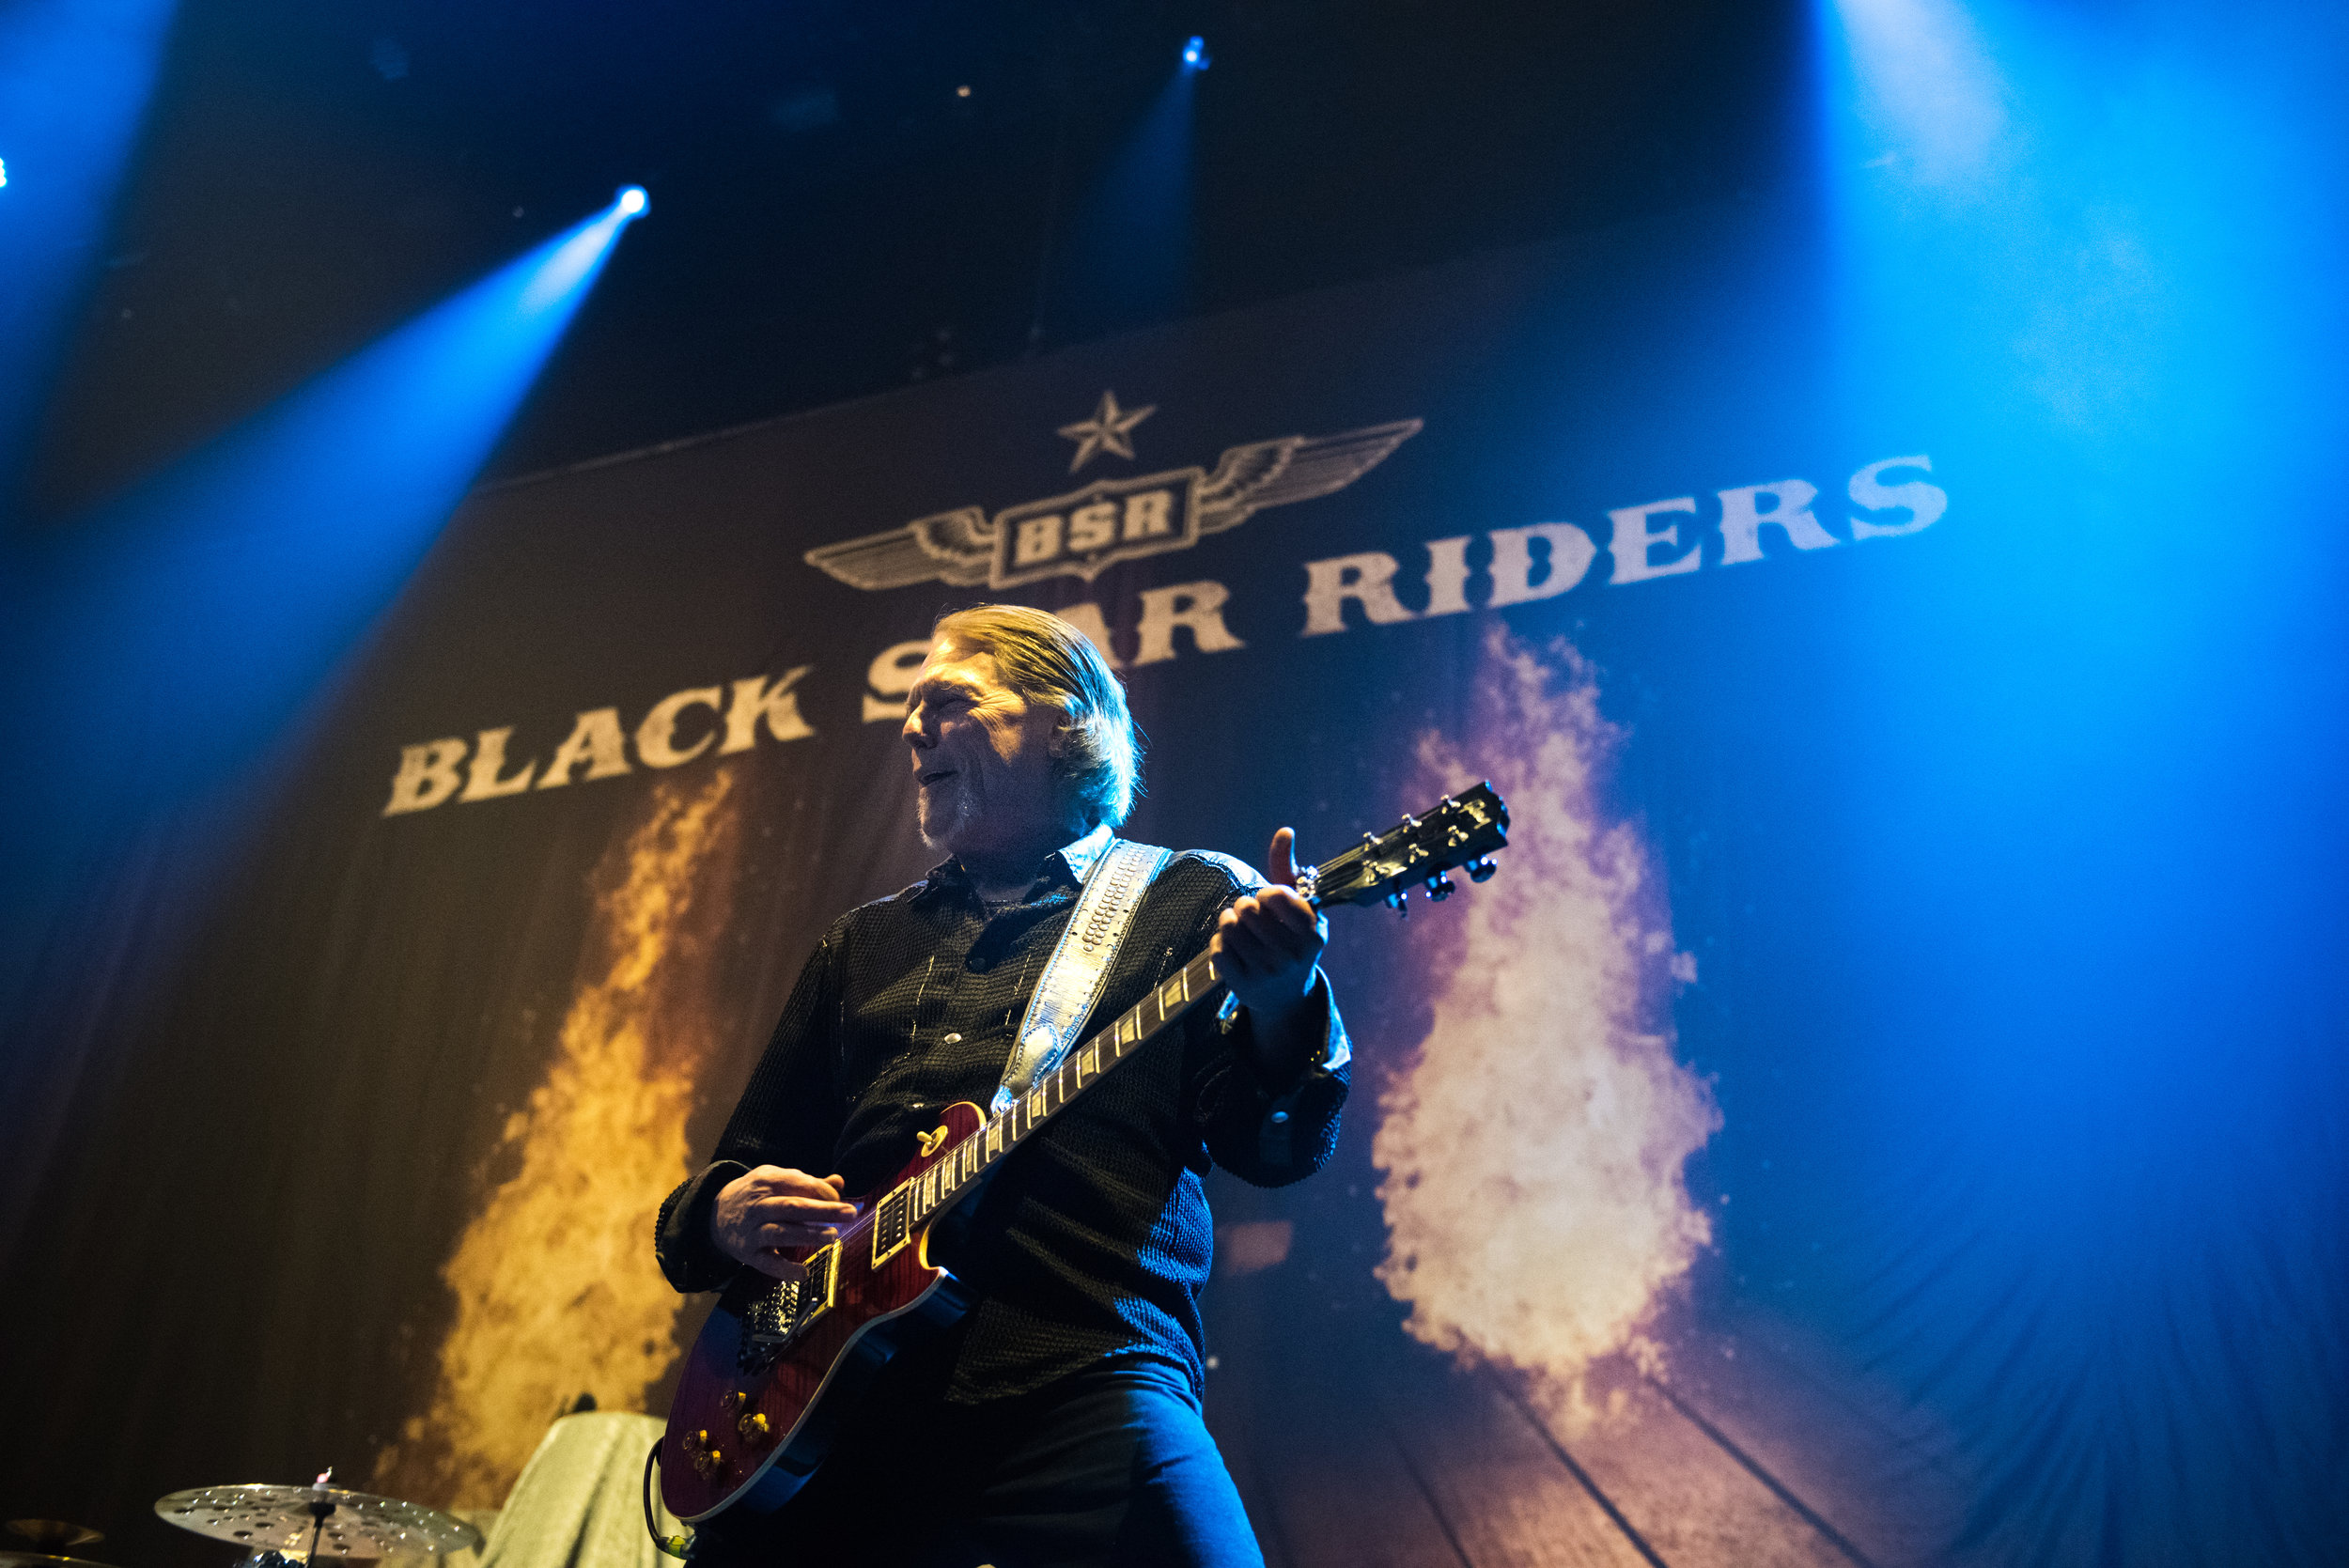 Black Star Rider - Print-2.jpg